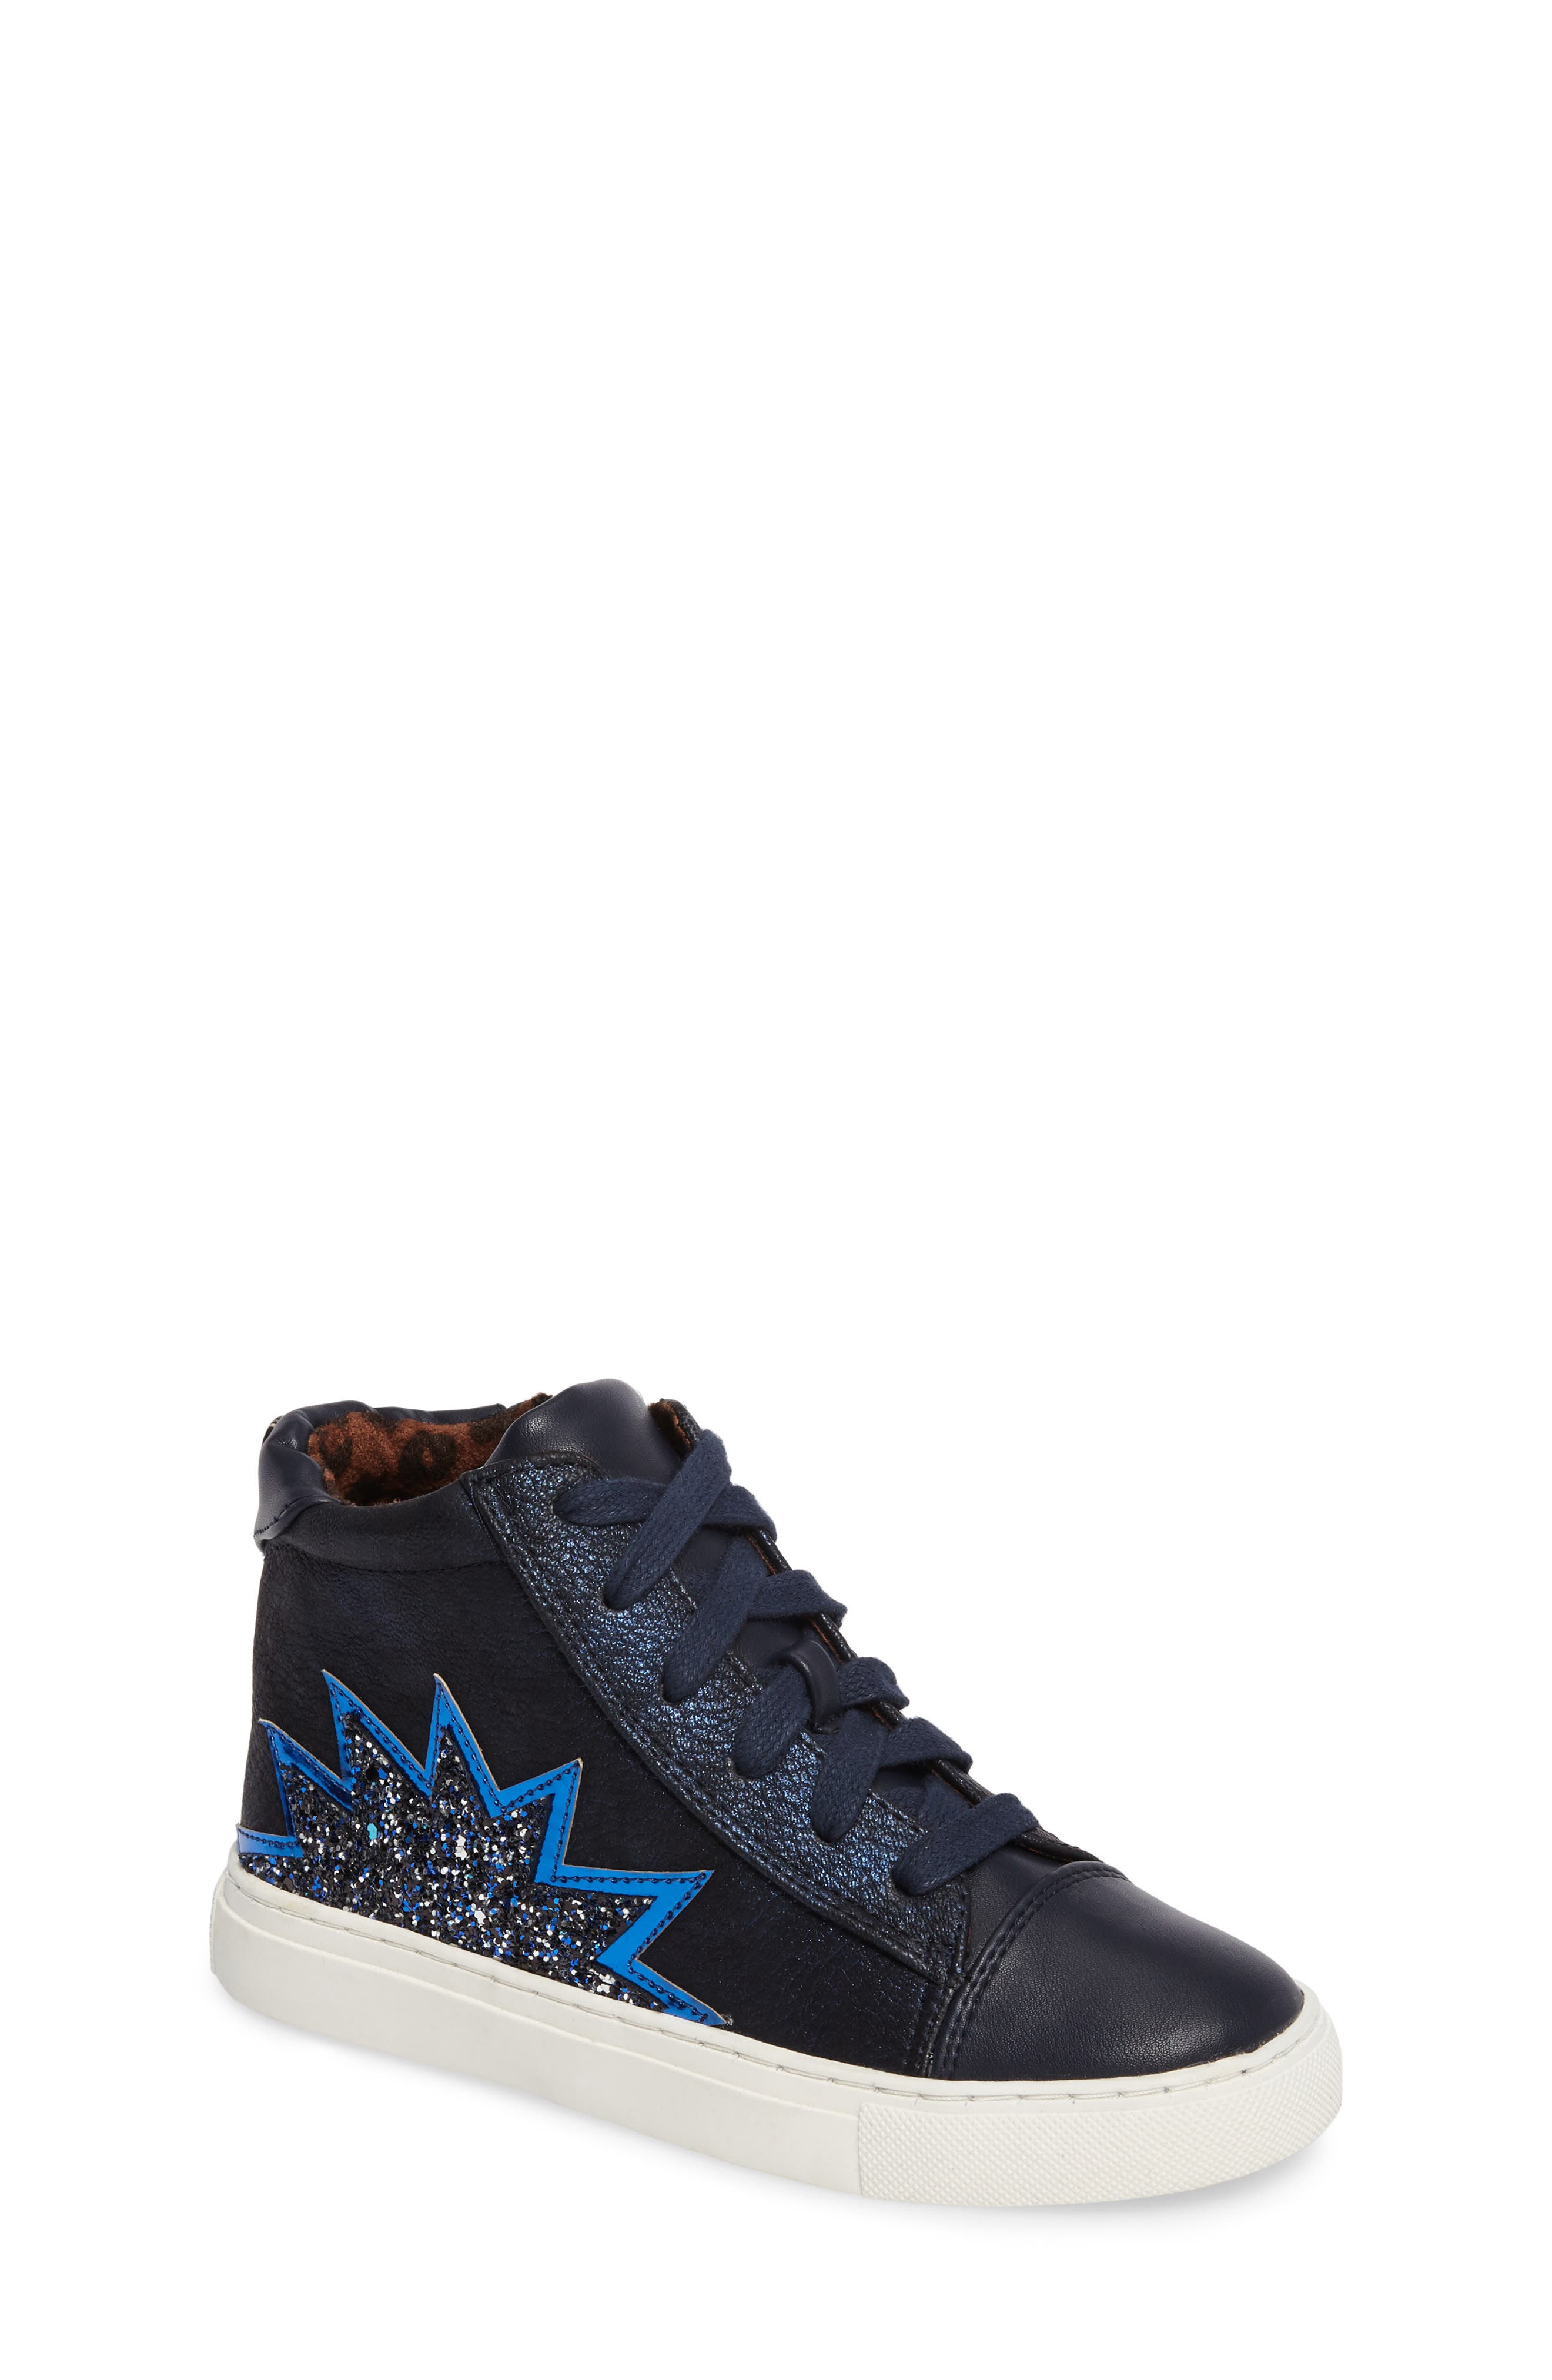 Jflash Glitter Star High Top Sneaker,                             Main thumbnail 1, color,